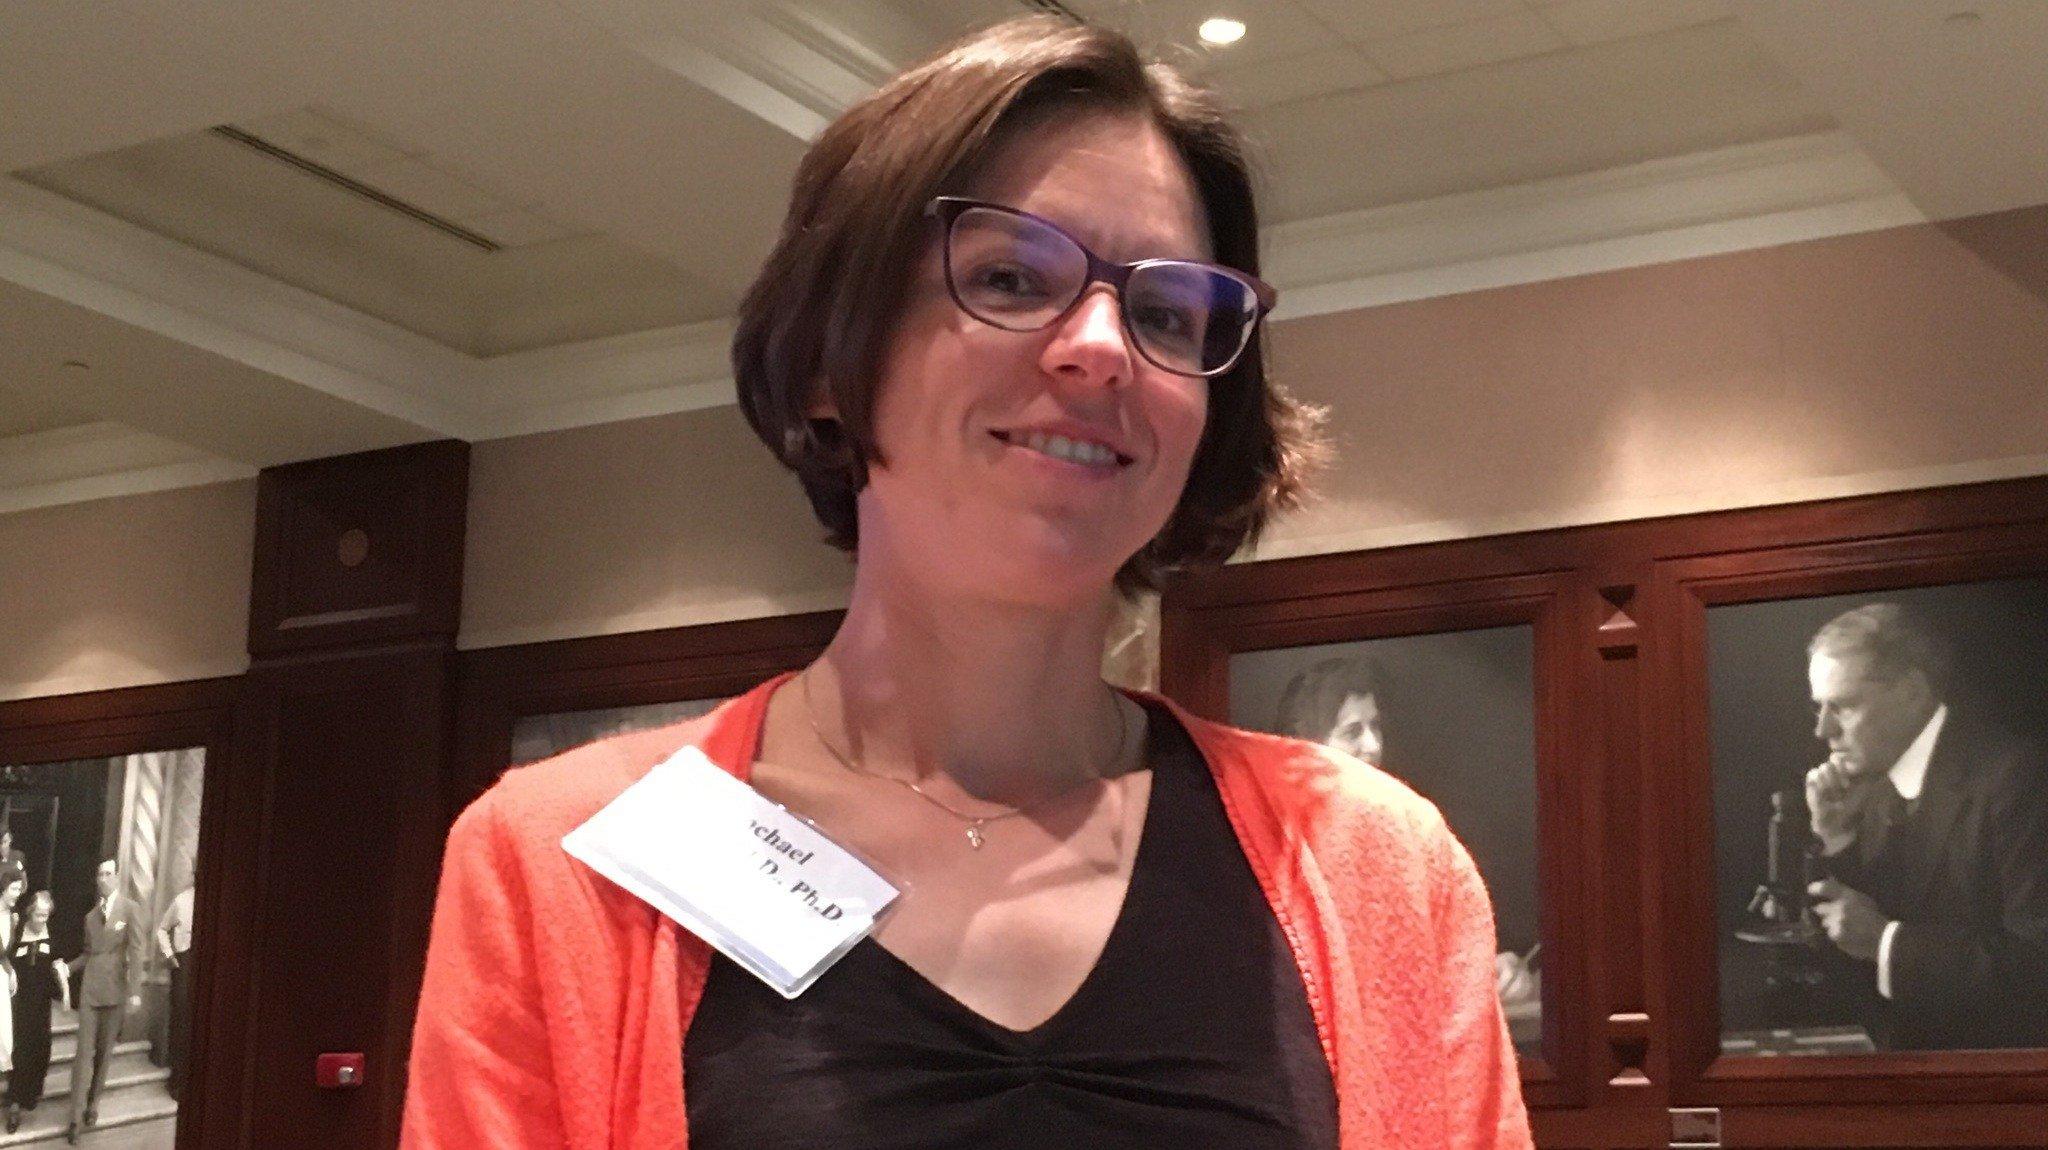 Rachael Vaubel, M.D., Ph.D.